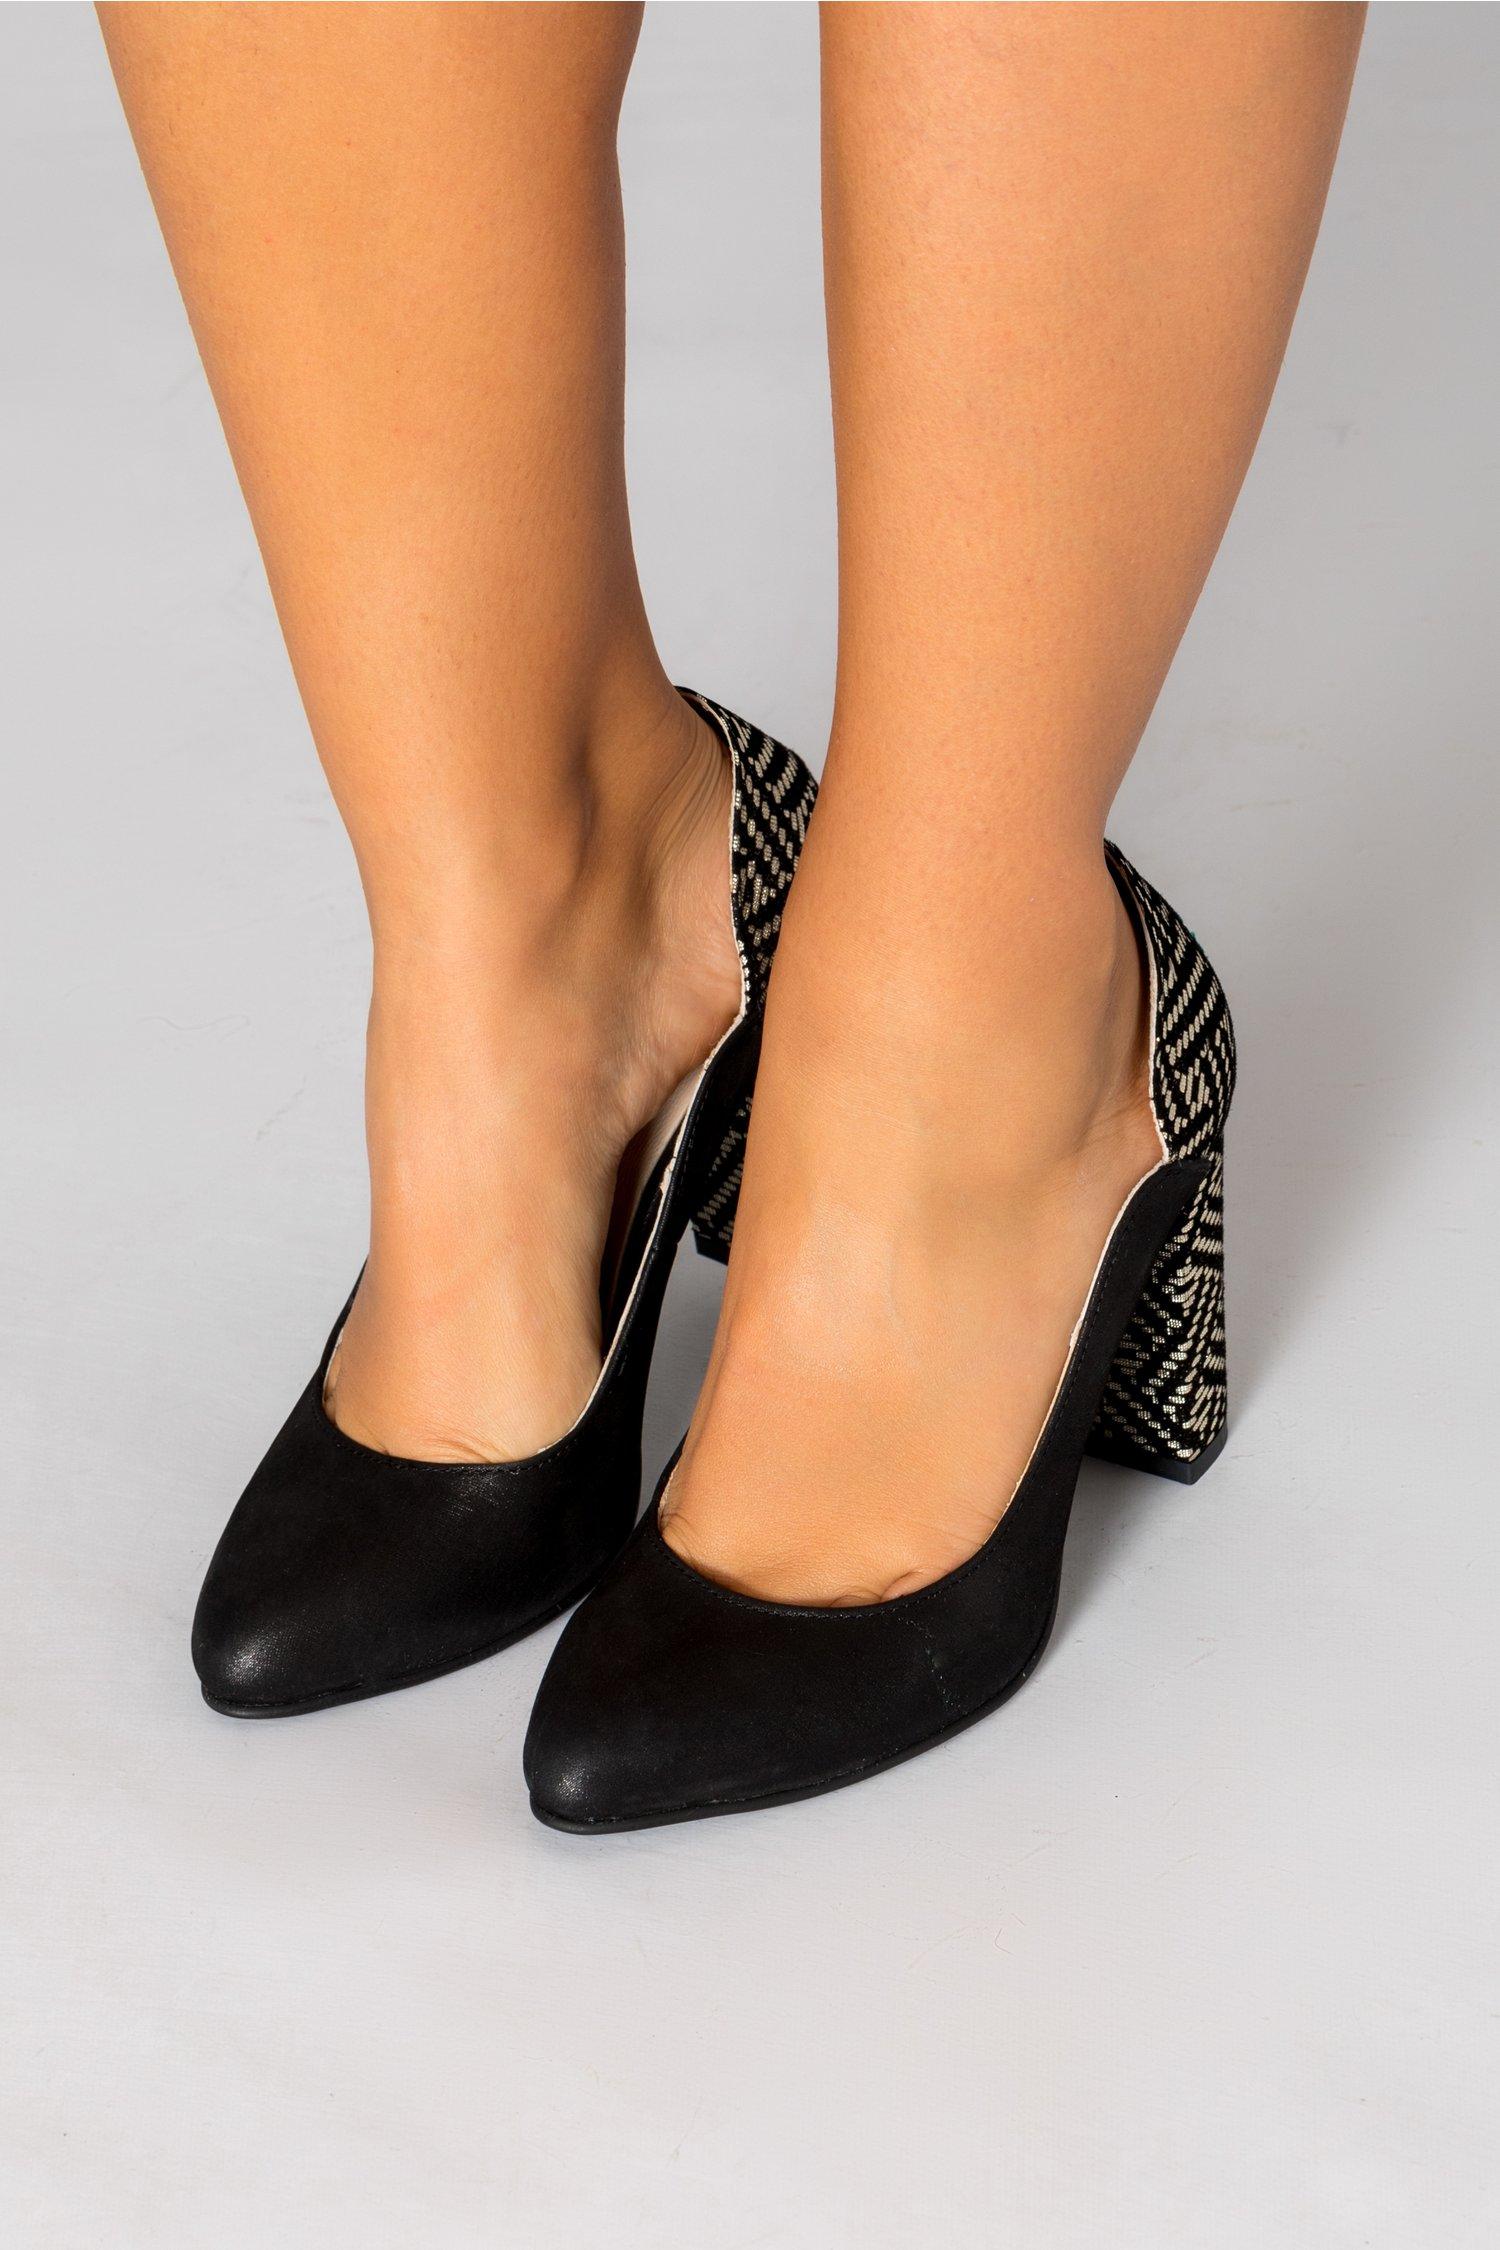 Pantofi dama negrii cu detalii argintii pe toc